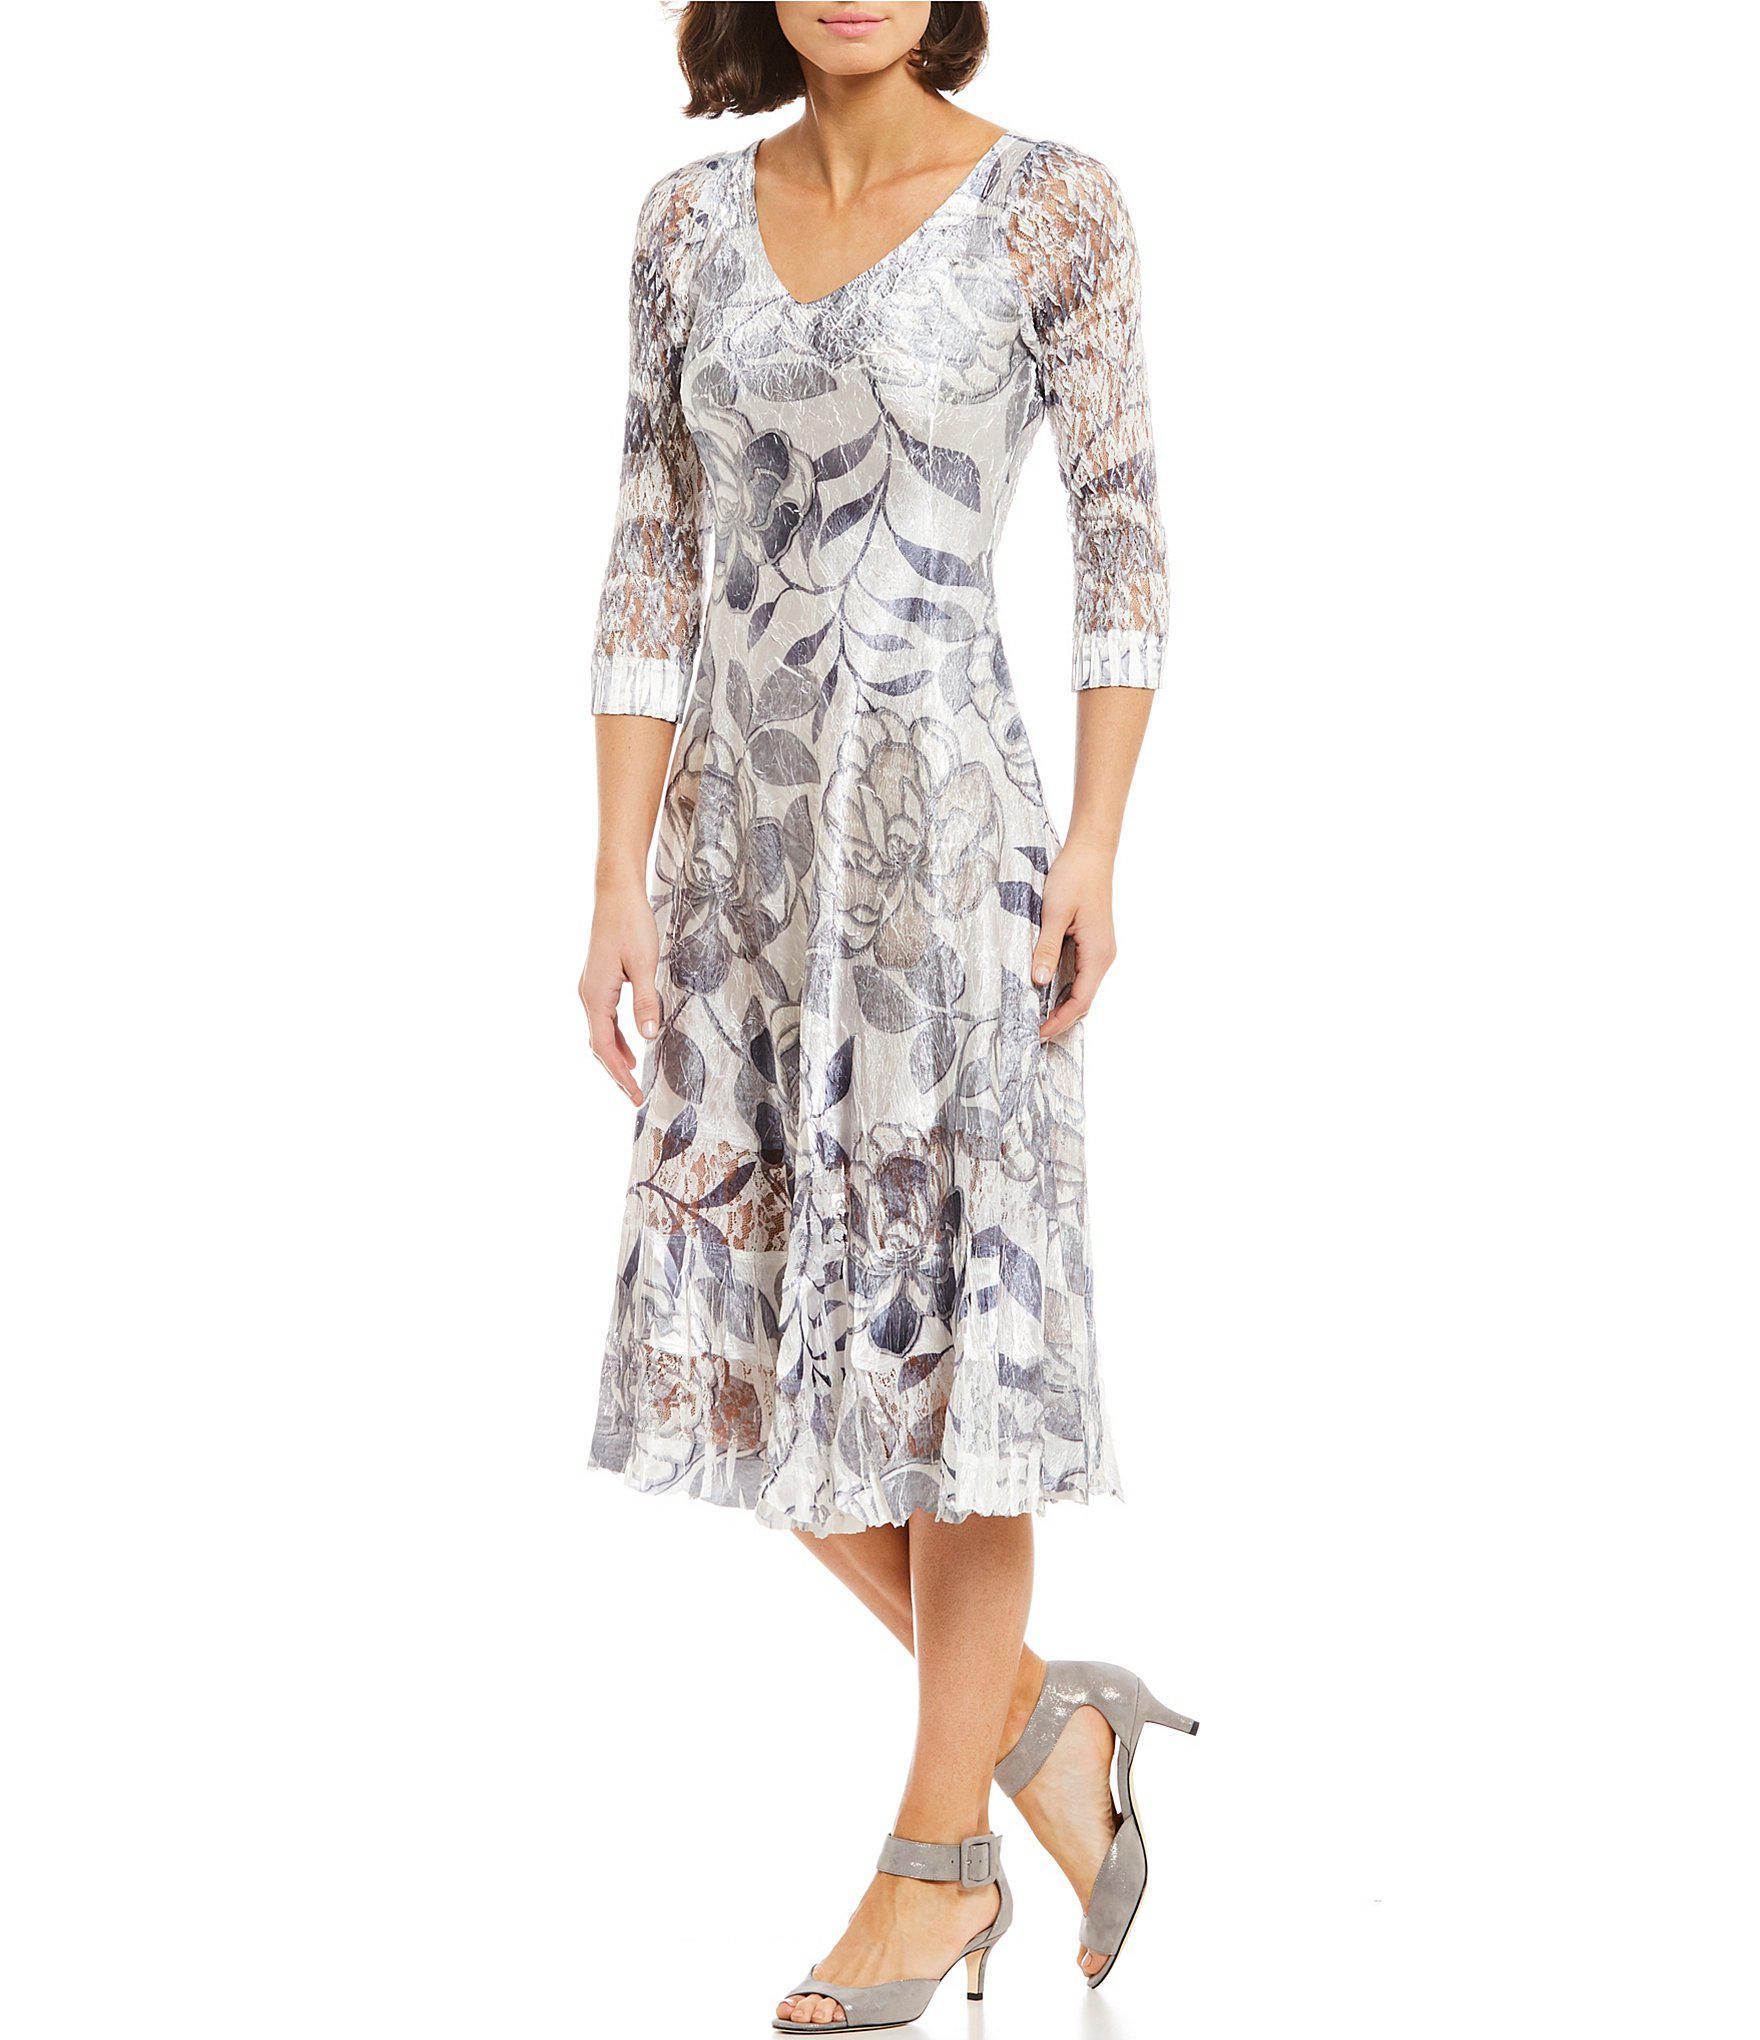 dc36b9901f Komarov V-neck Floral Print Midi Dress - Lyst